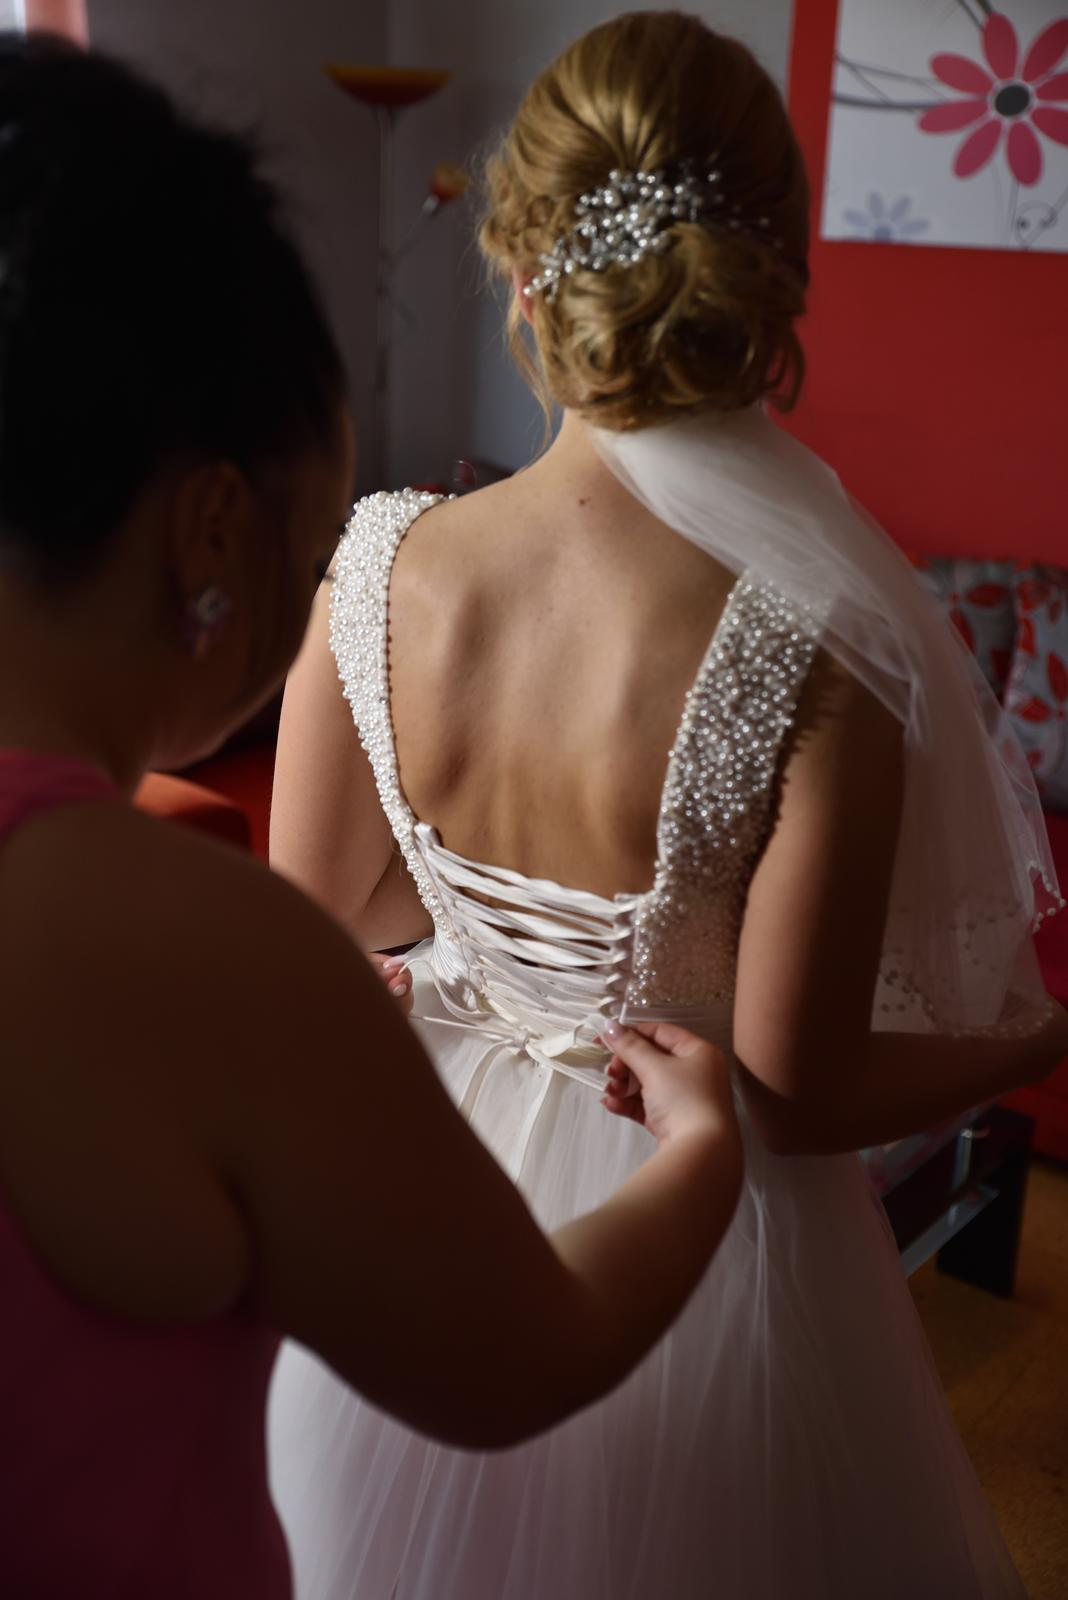 Perličkové svadobné šaty - Obrázok č. 3